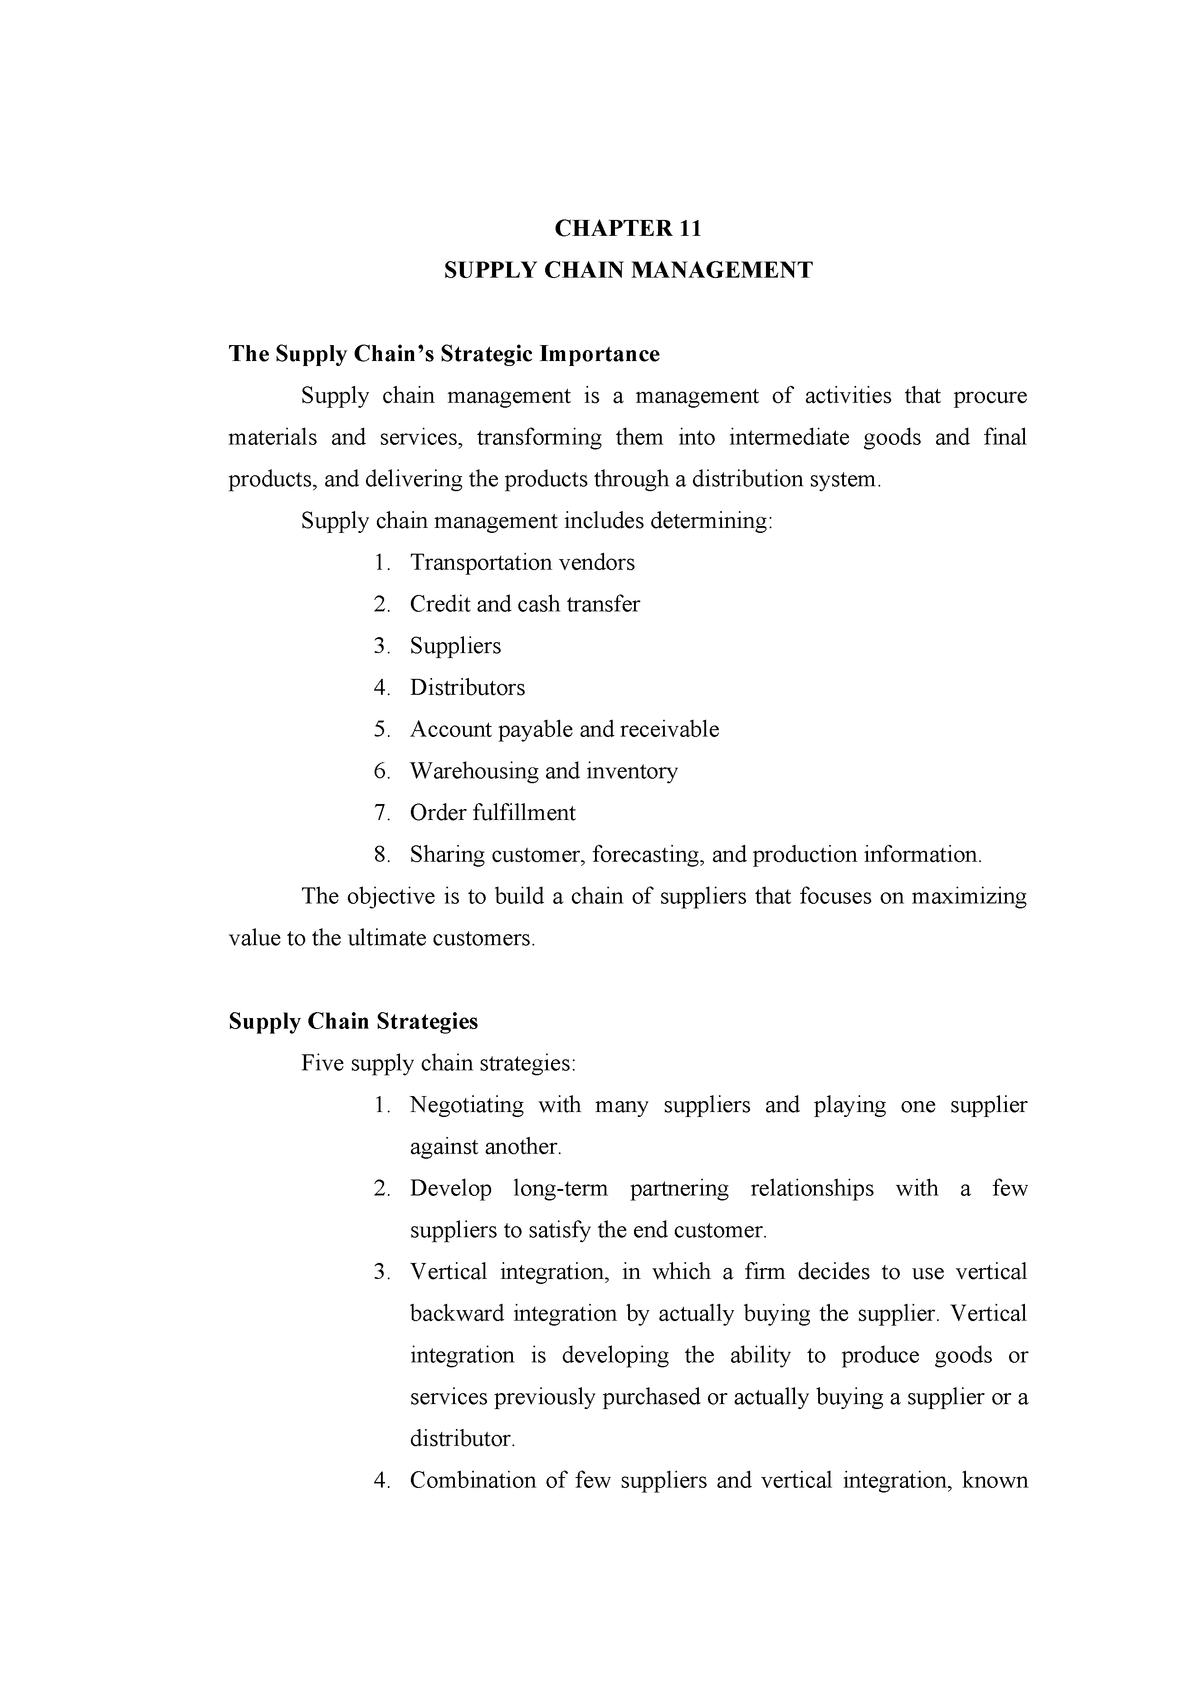 Summary Operations Management - Chapter 11 - MAN355 - StuDocu